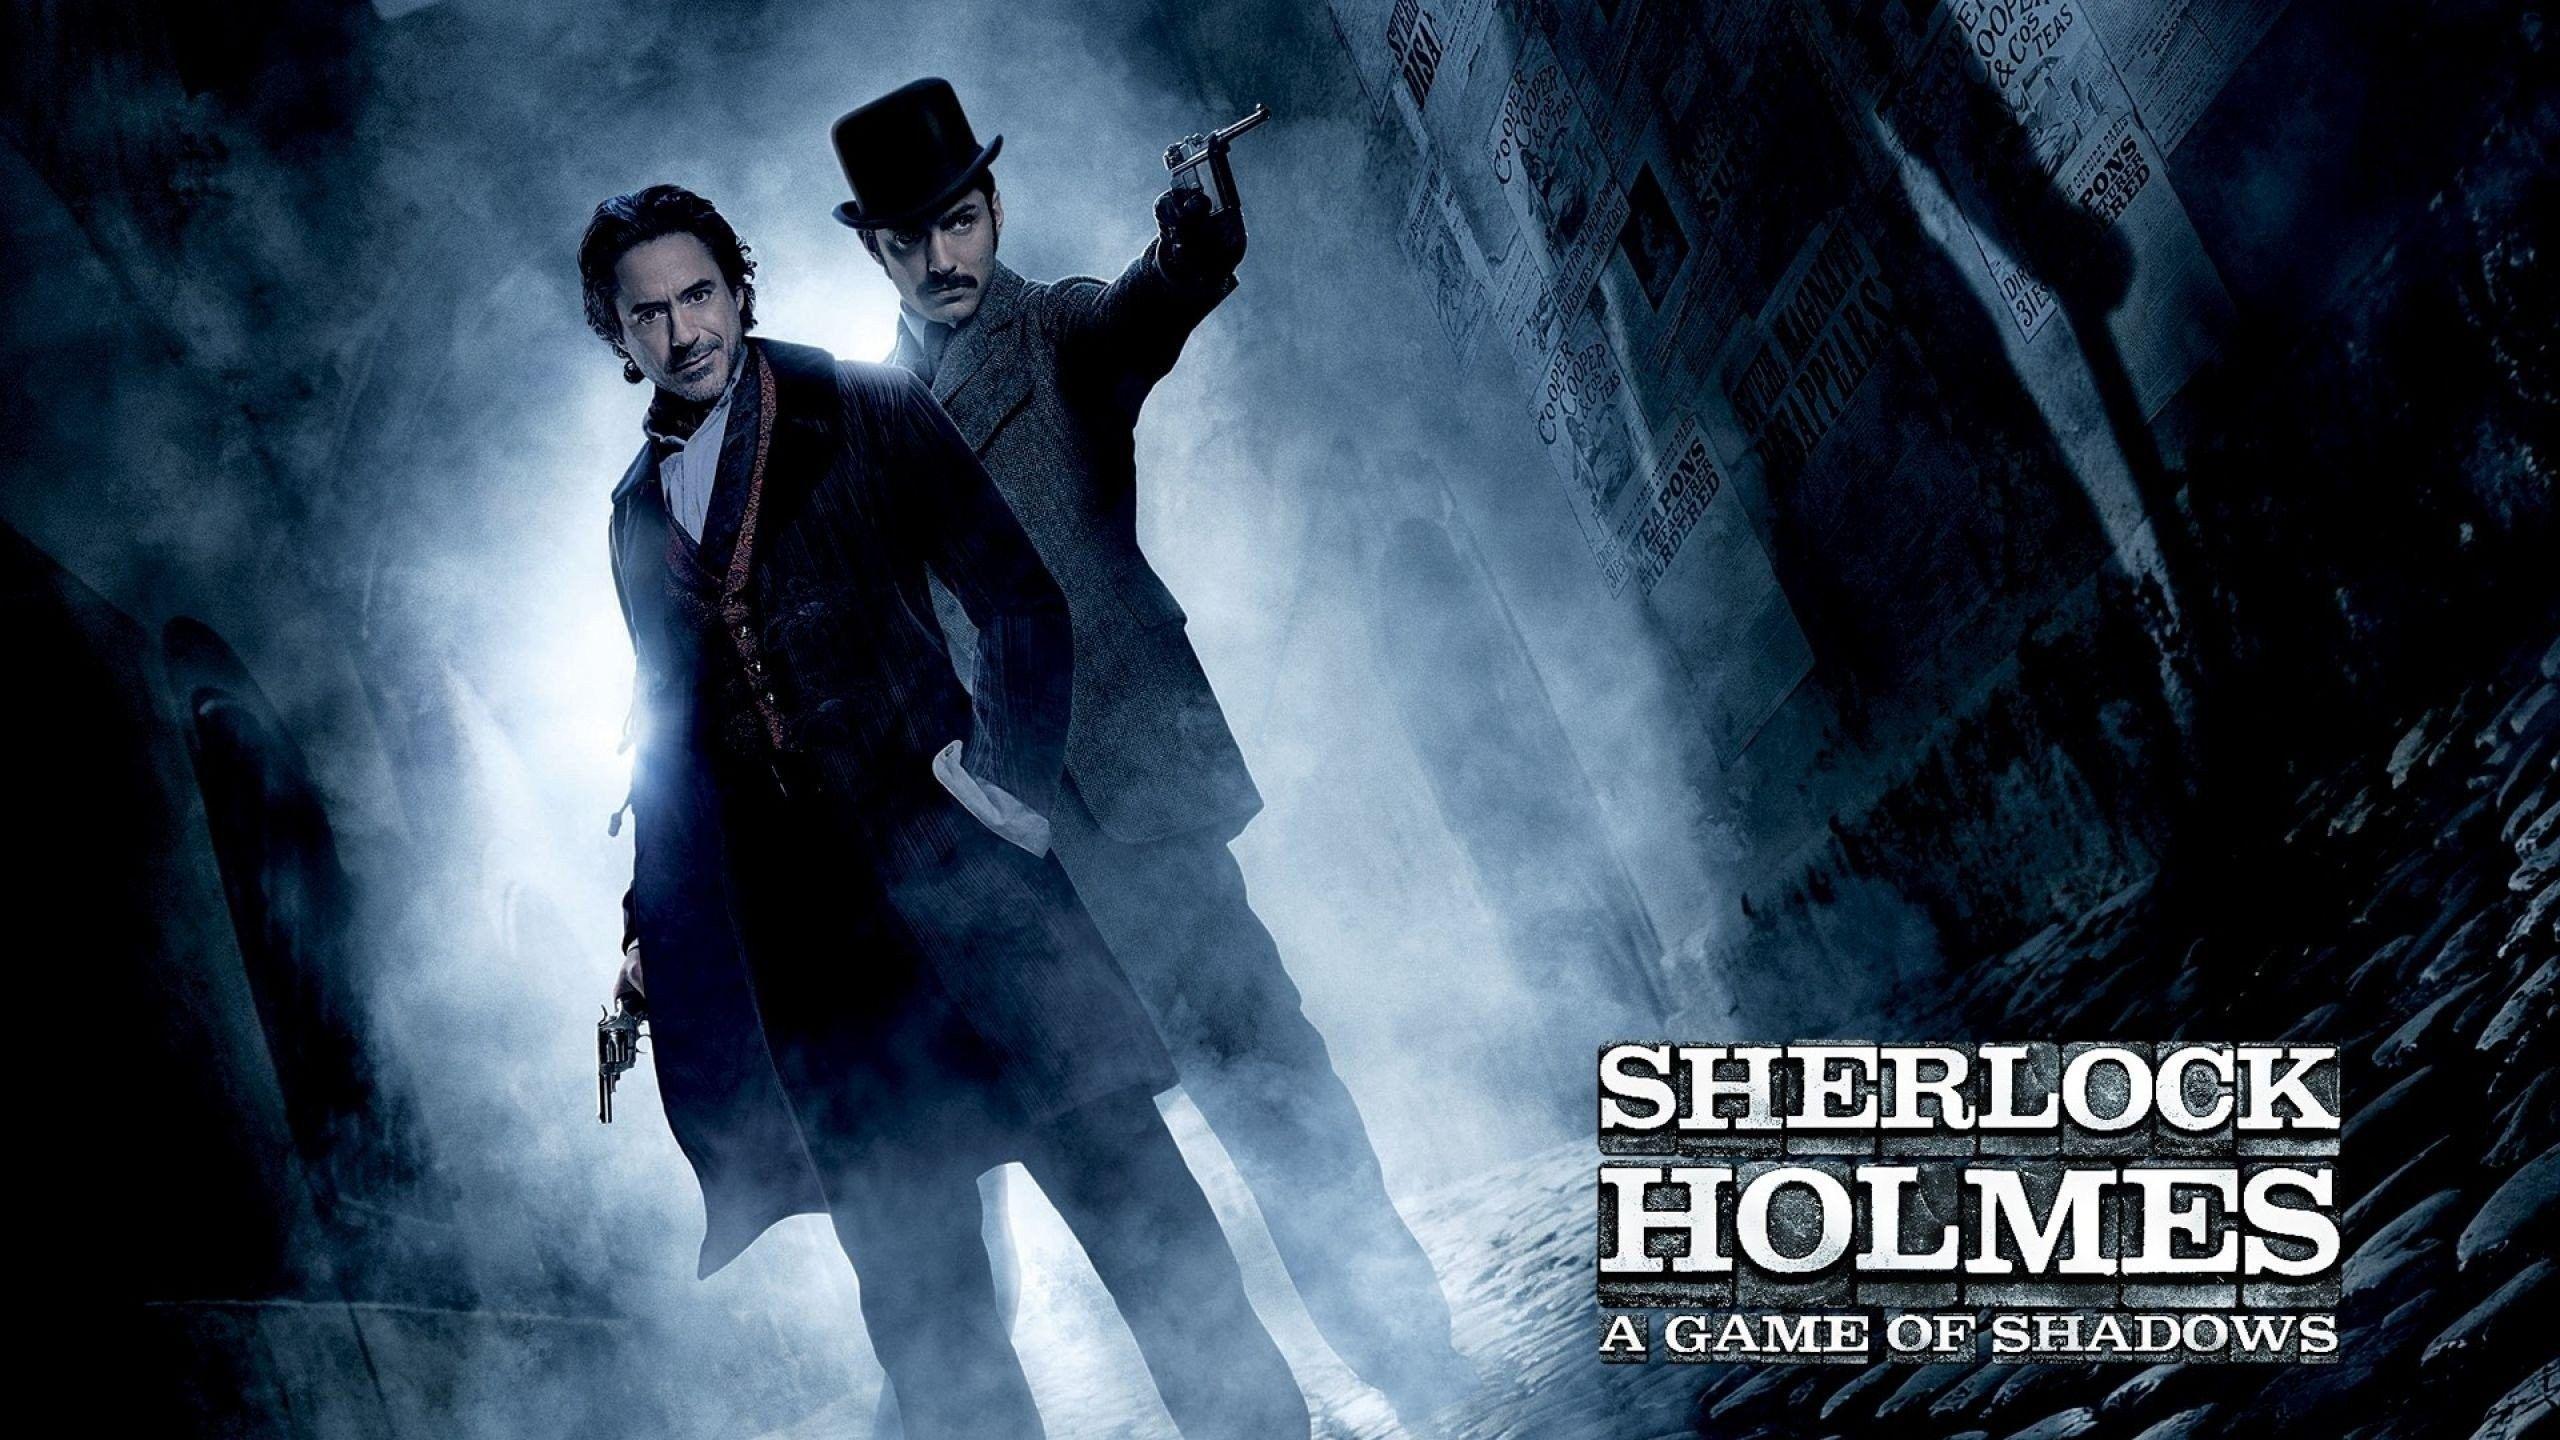 Sherlock Holmes Wallpapers Hd Wallpaper Cave